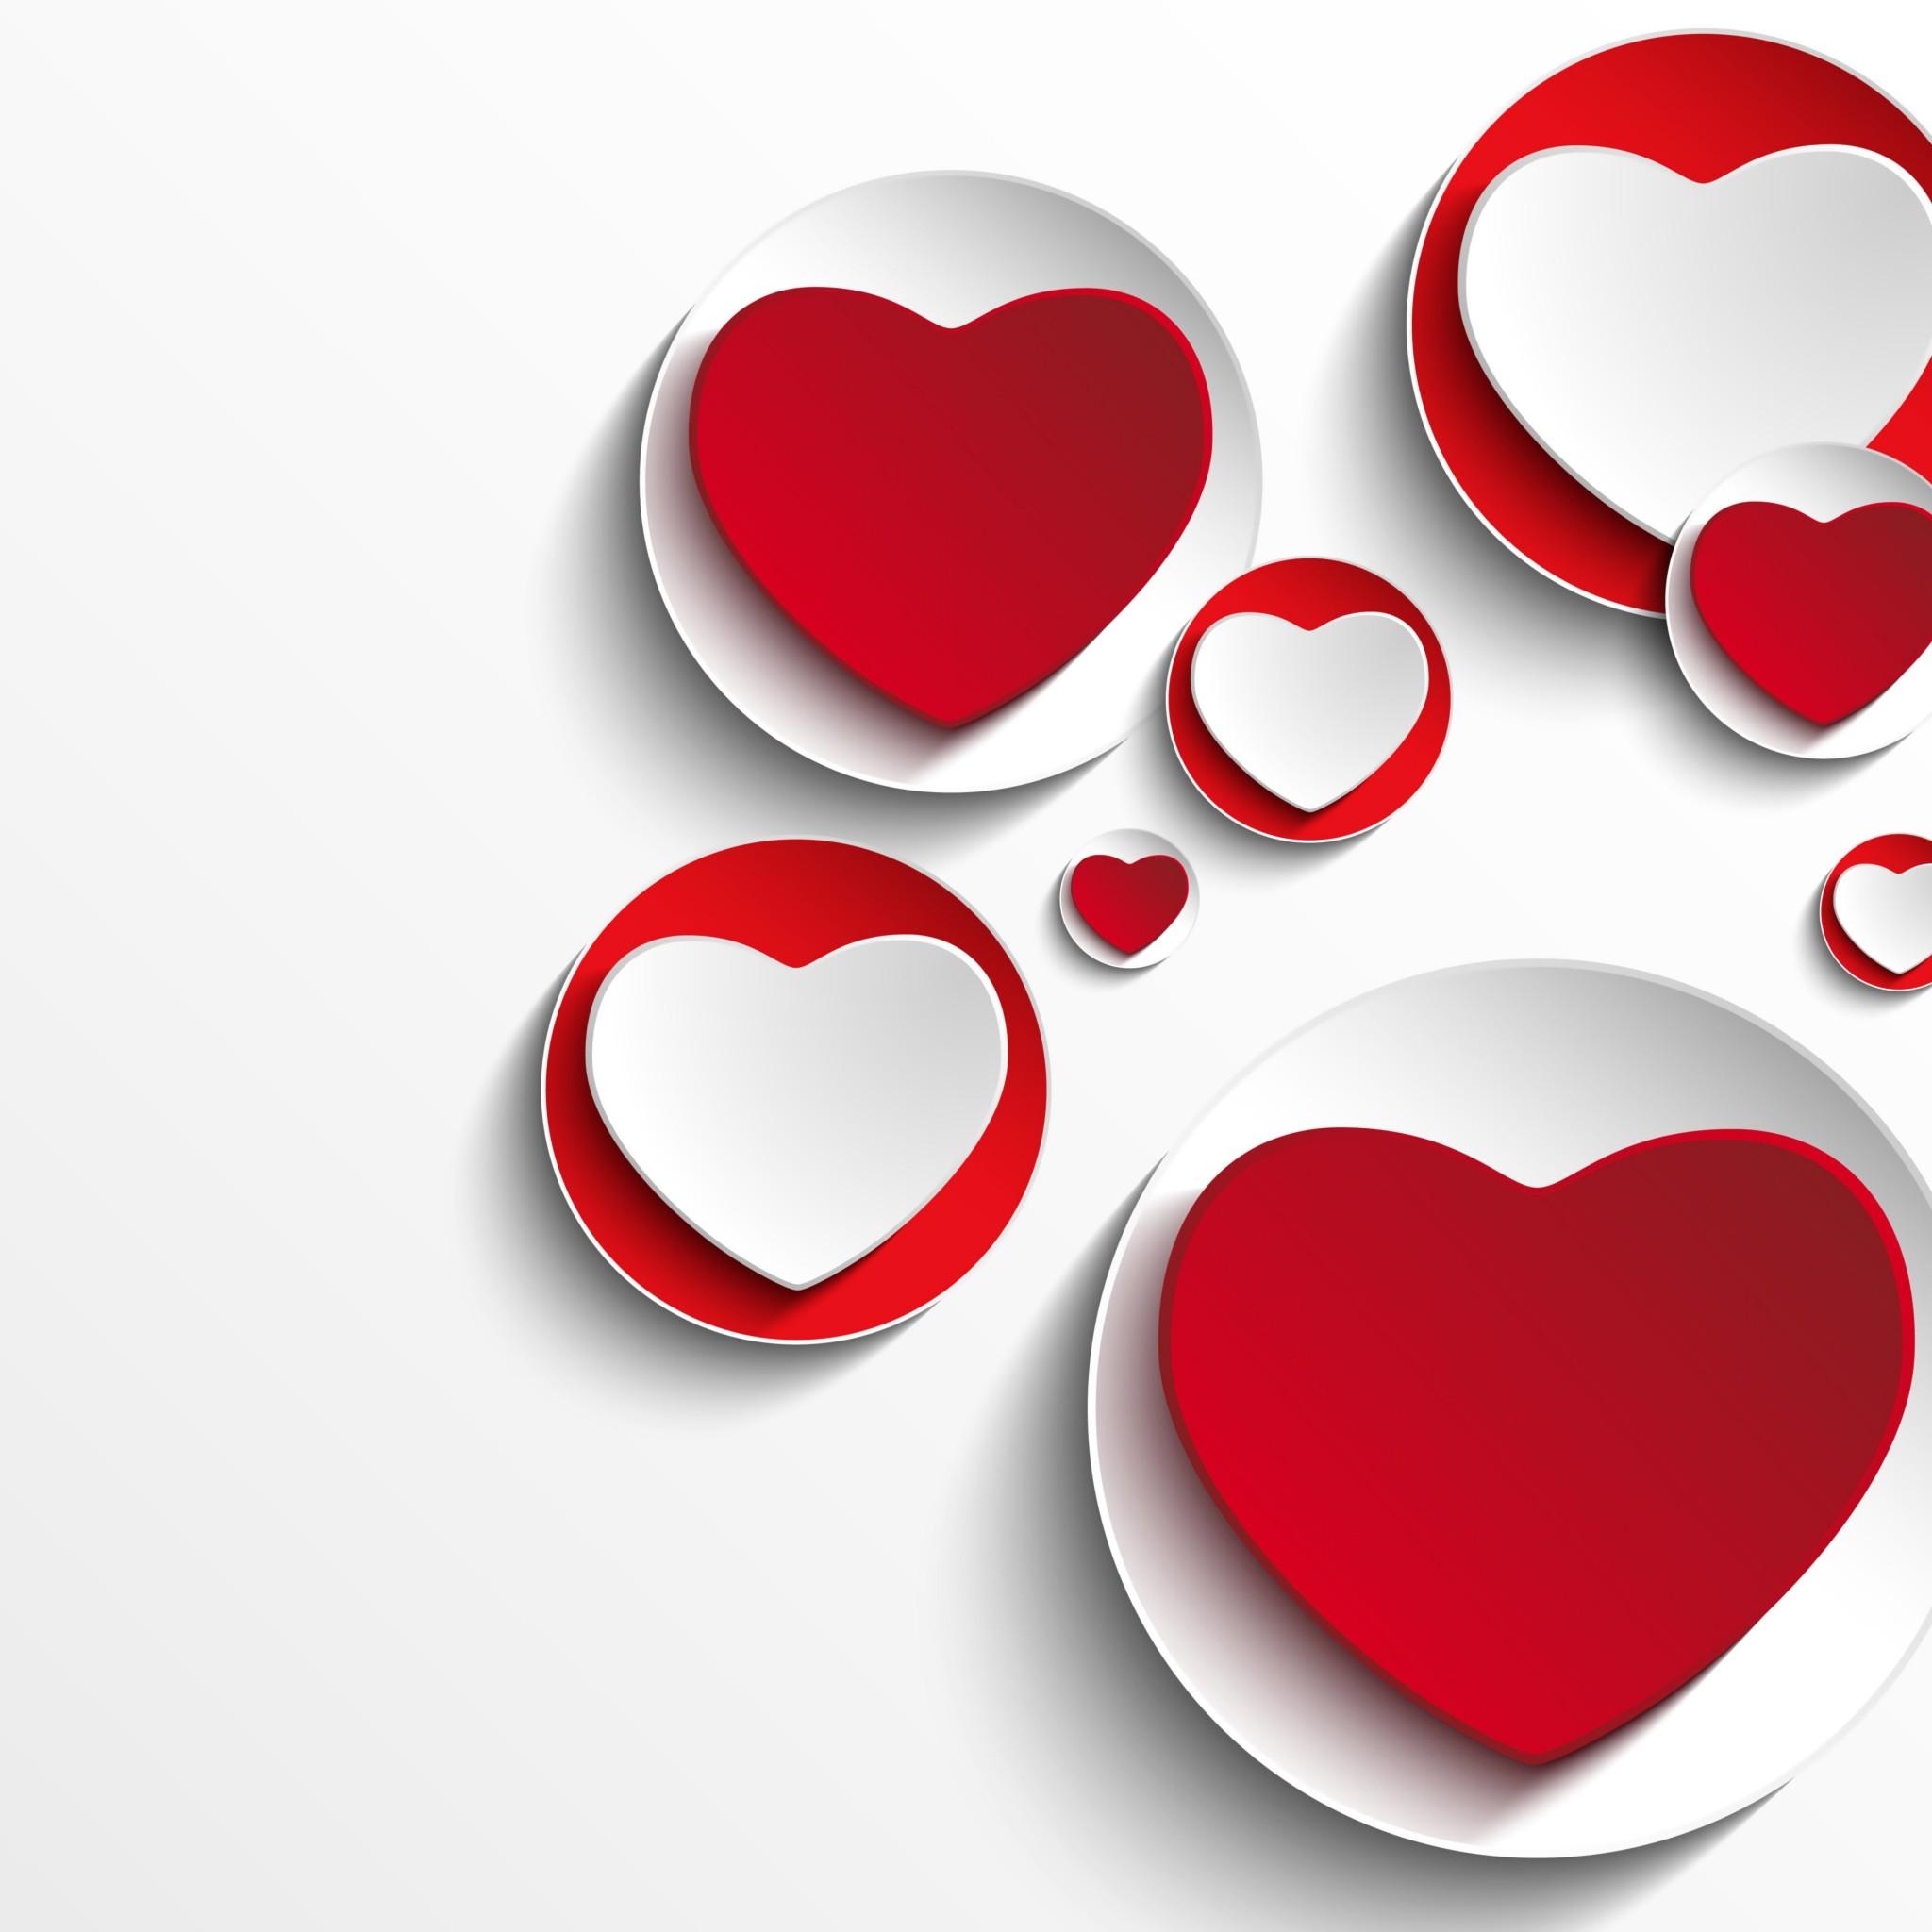 Minimalistic Hearts Shapes Hd Wallpaper For Nexus 9